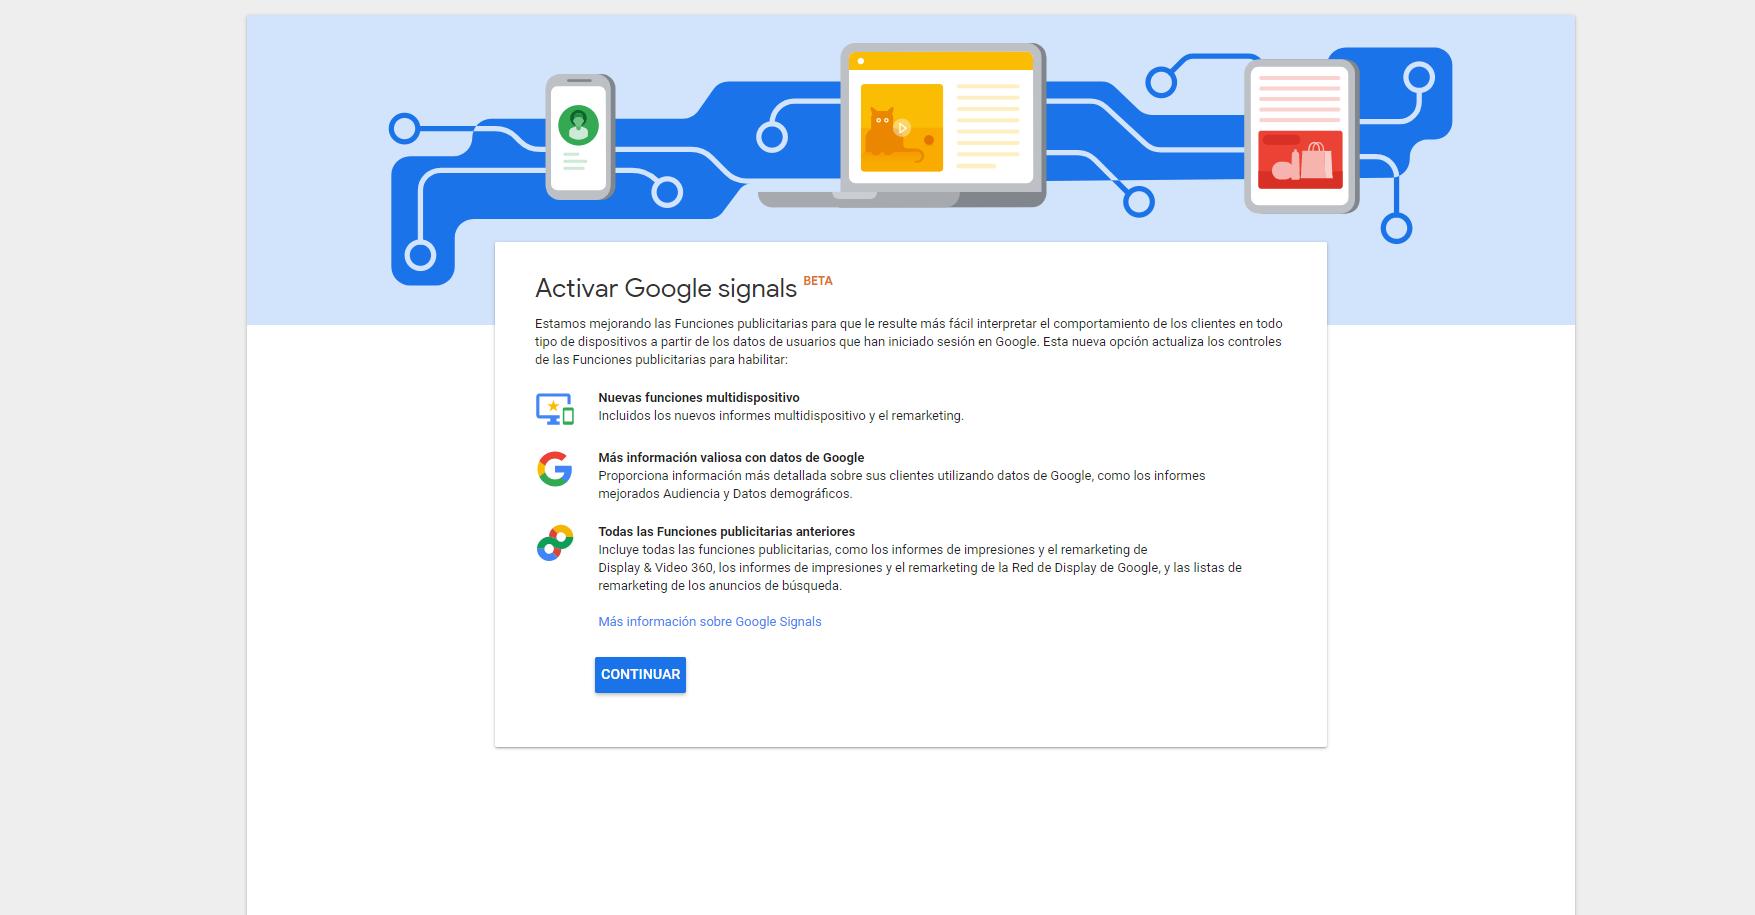 Siguiente paso de Activar Google Signals